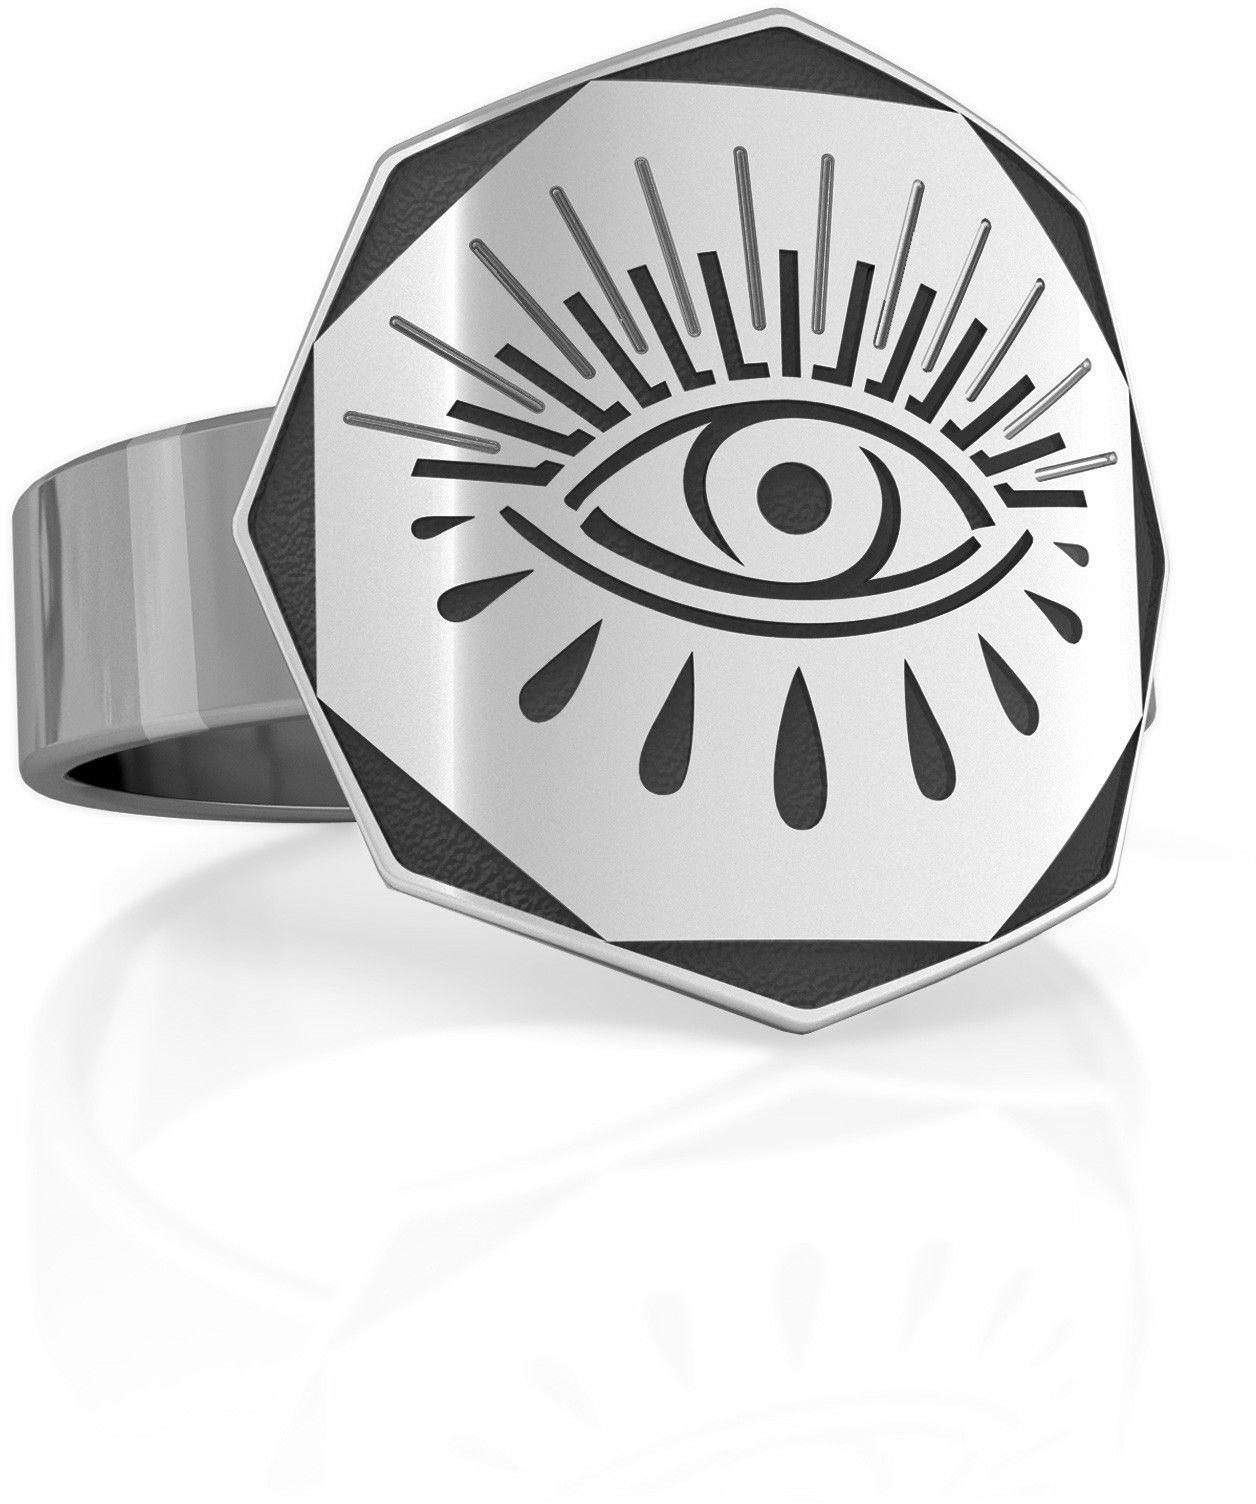 Srebrny sygnet oko Horusa, MON DÉFI, srebro 925 : ROZMIAR PIERŚCIONKA - 17 UK:R 18,00 MM, Srebro - kolor pokrycia - Pokrycie platyną